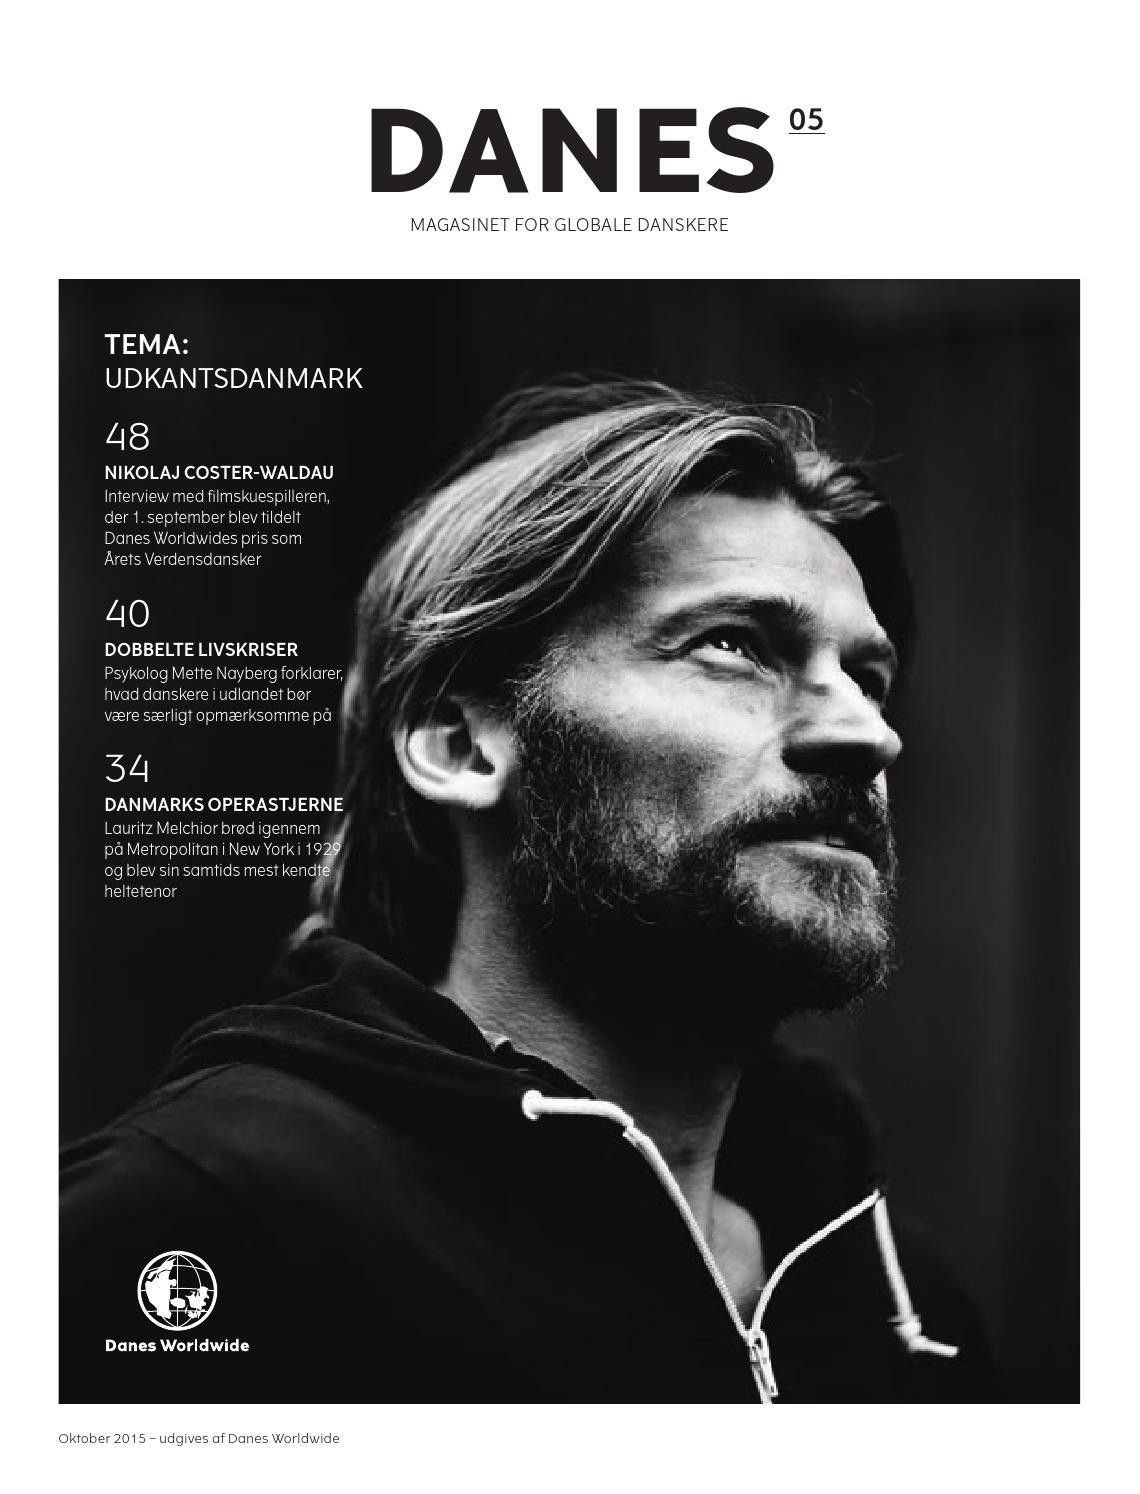 Nikolaj Coster Waldau For Danes Magazine Photo Cover By Scanpix October 2015 Nikolaj Coster Waldau Photo Photoshoot